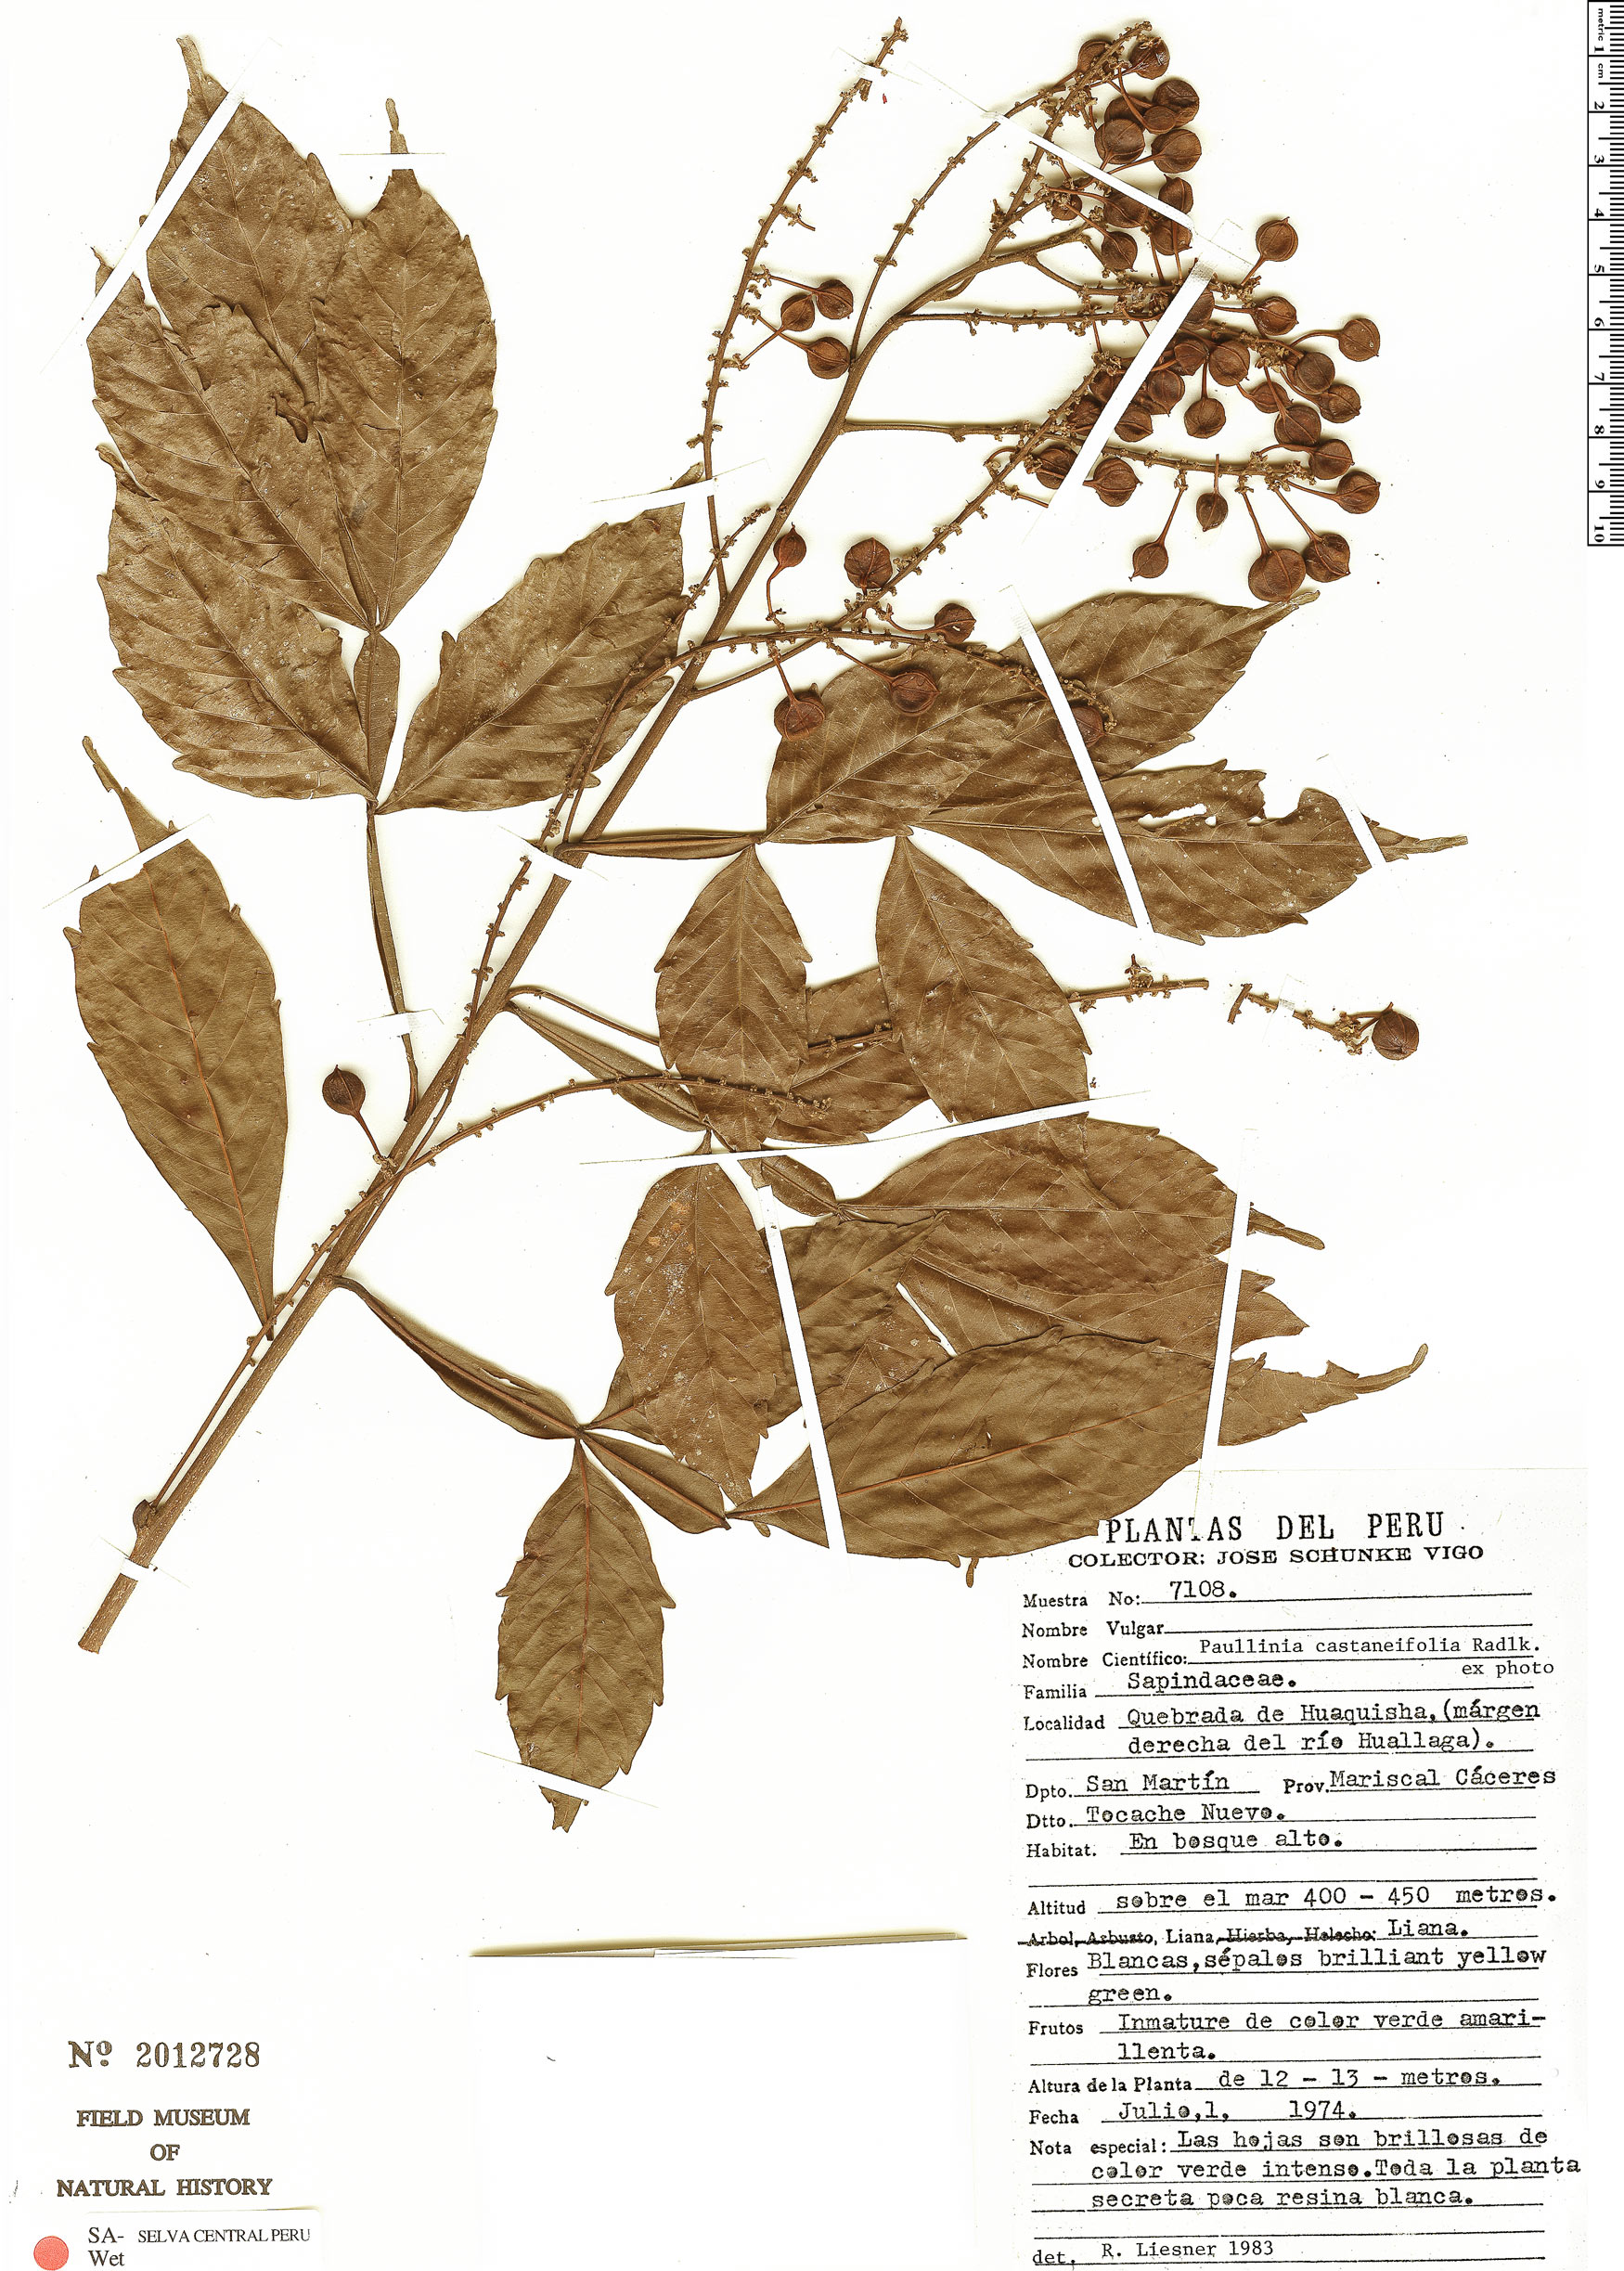 Espécimen: Paullinia castaneifolia